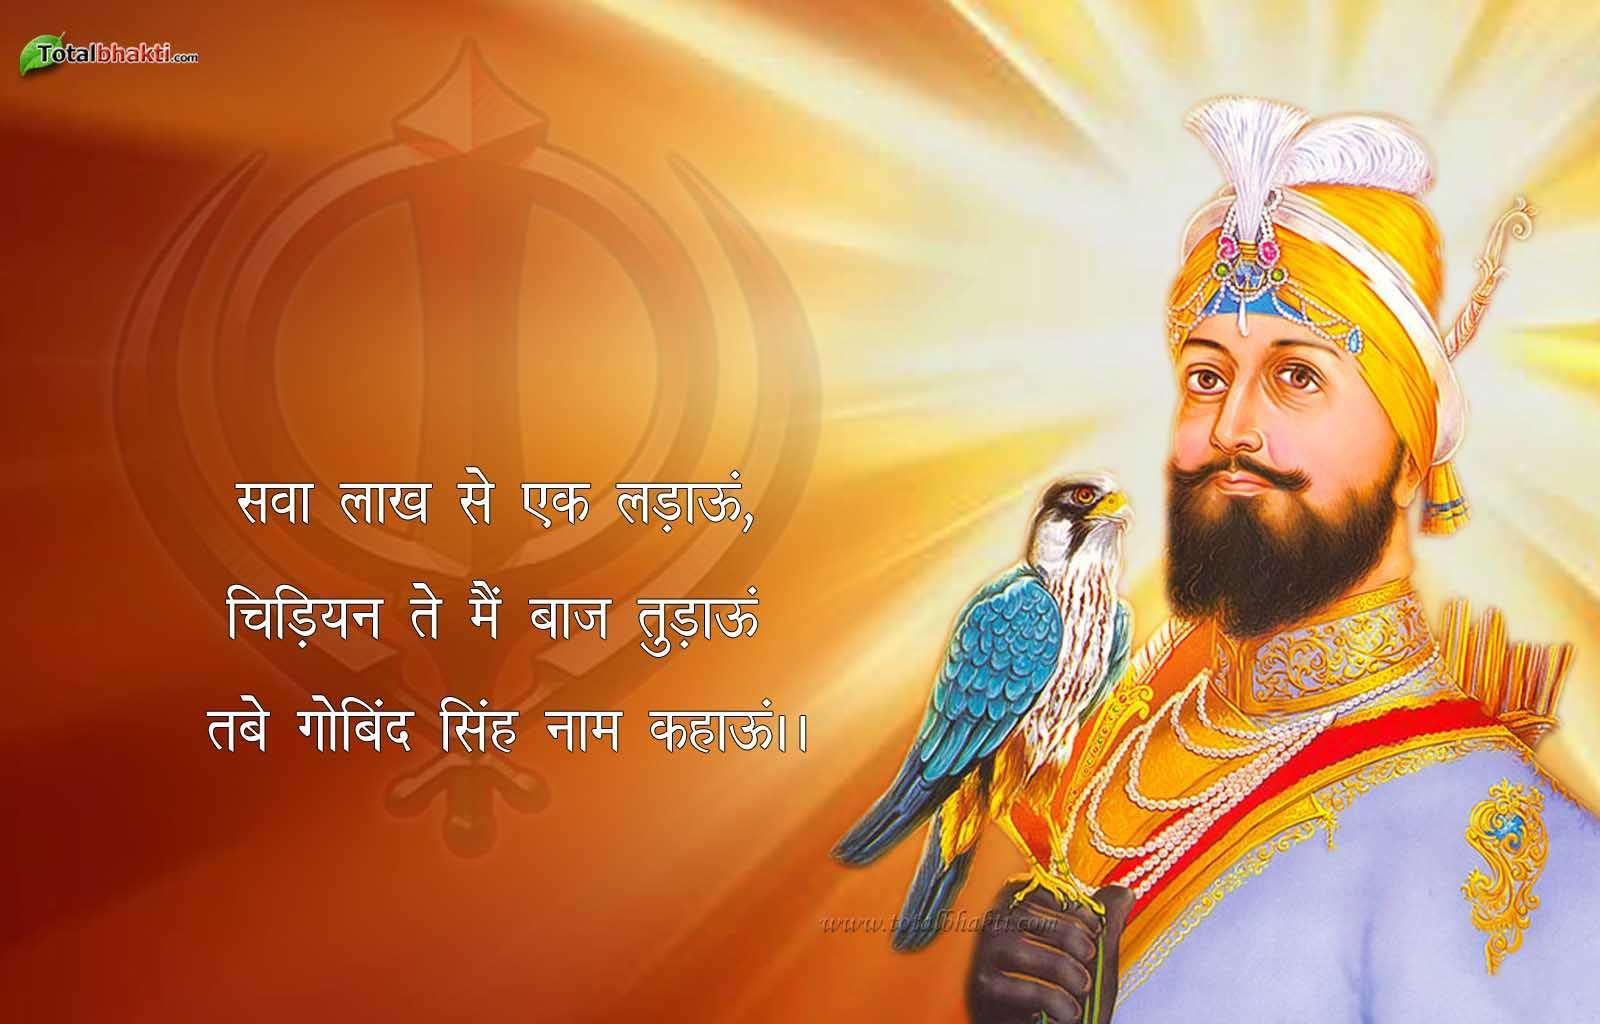 2017 05 guru nanak dev ji quotes - 49394_guru Gobind Singh Wallpaper Brown Orange White Color_1600x1024